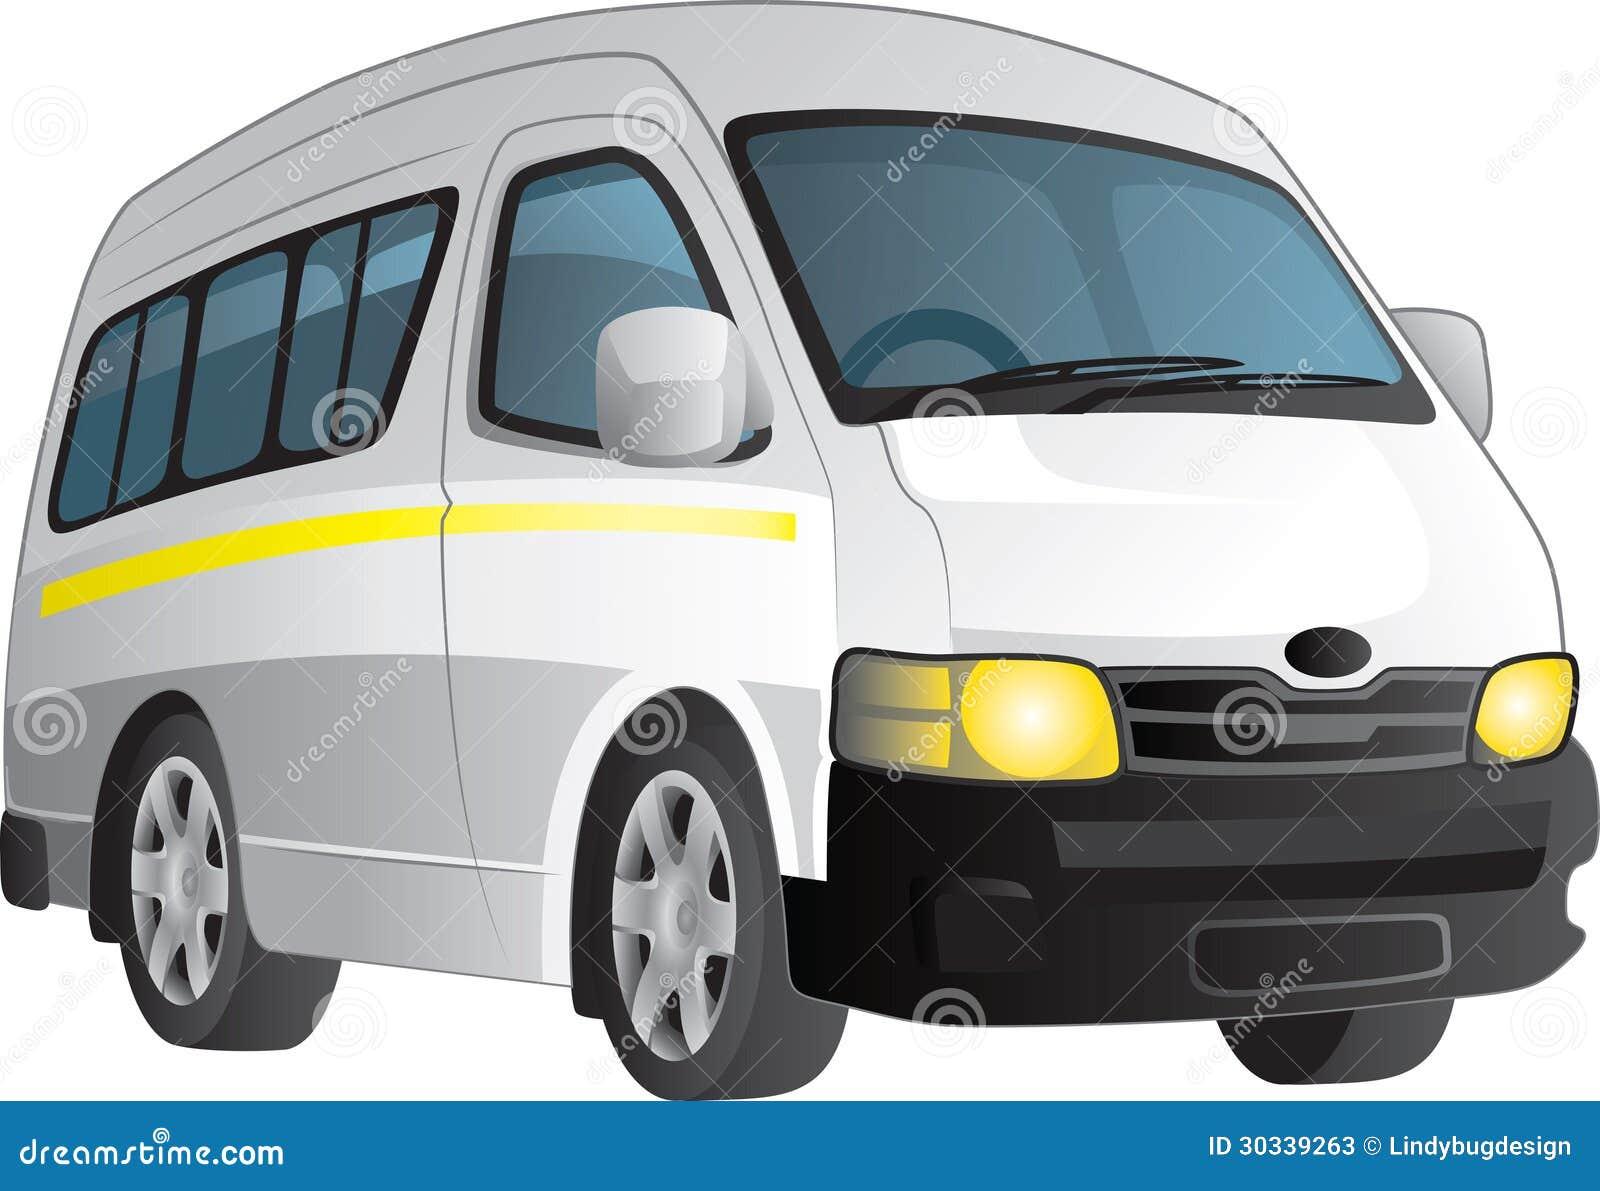 Stock Photos White Minibus Taxi Vector Cartoon Plain Image30339263 on Tree Clip Art